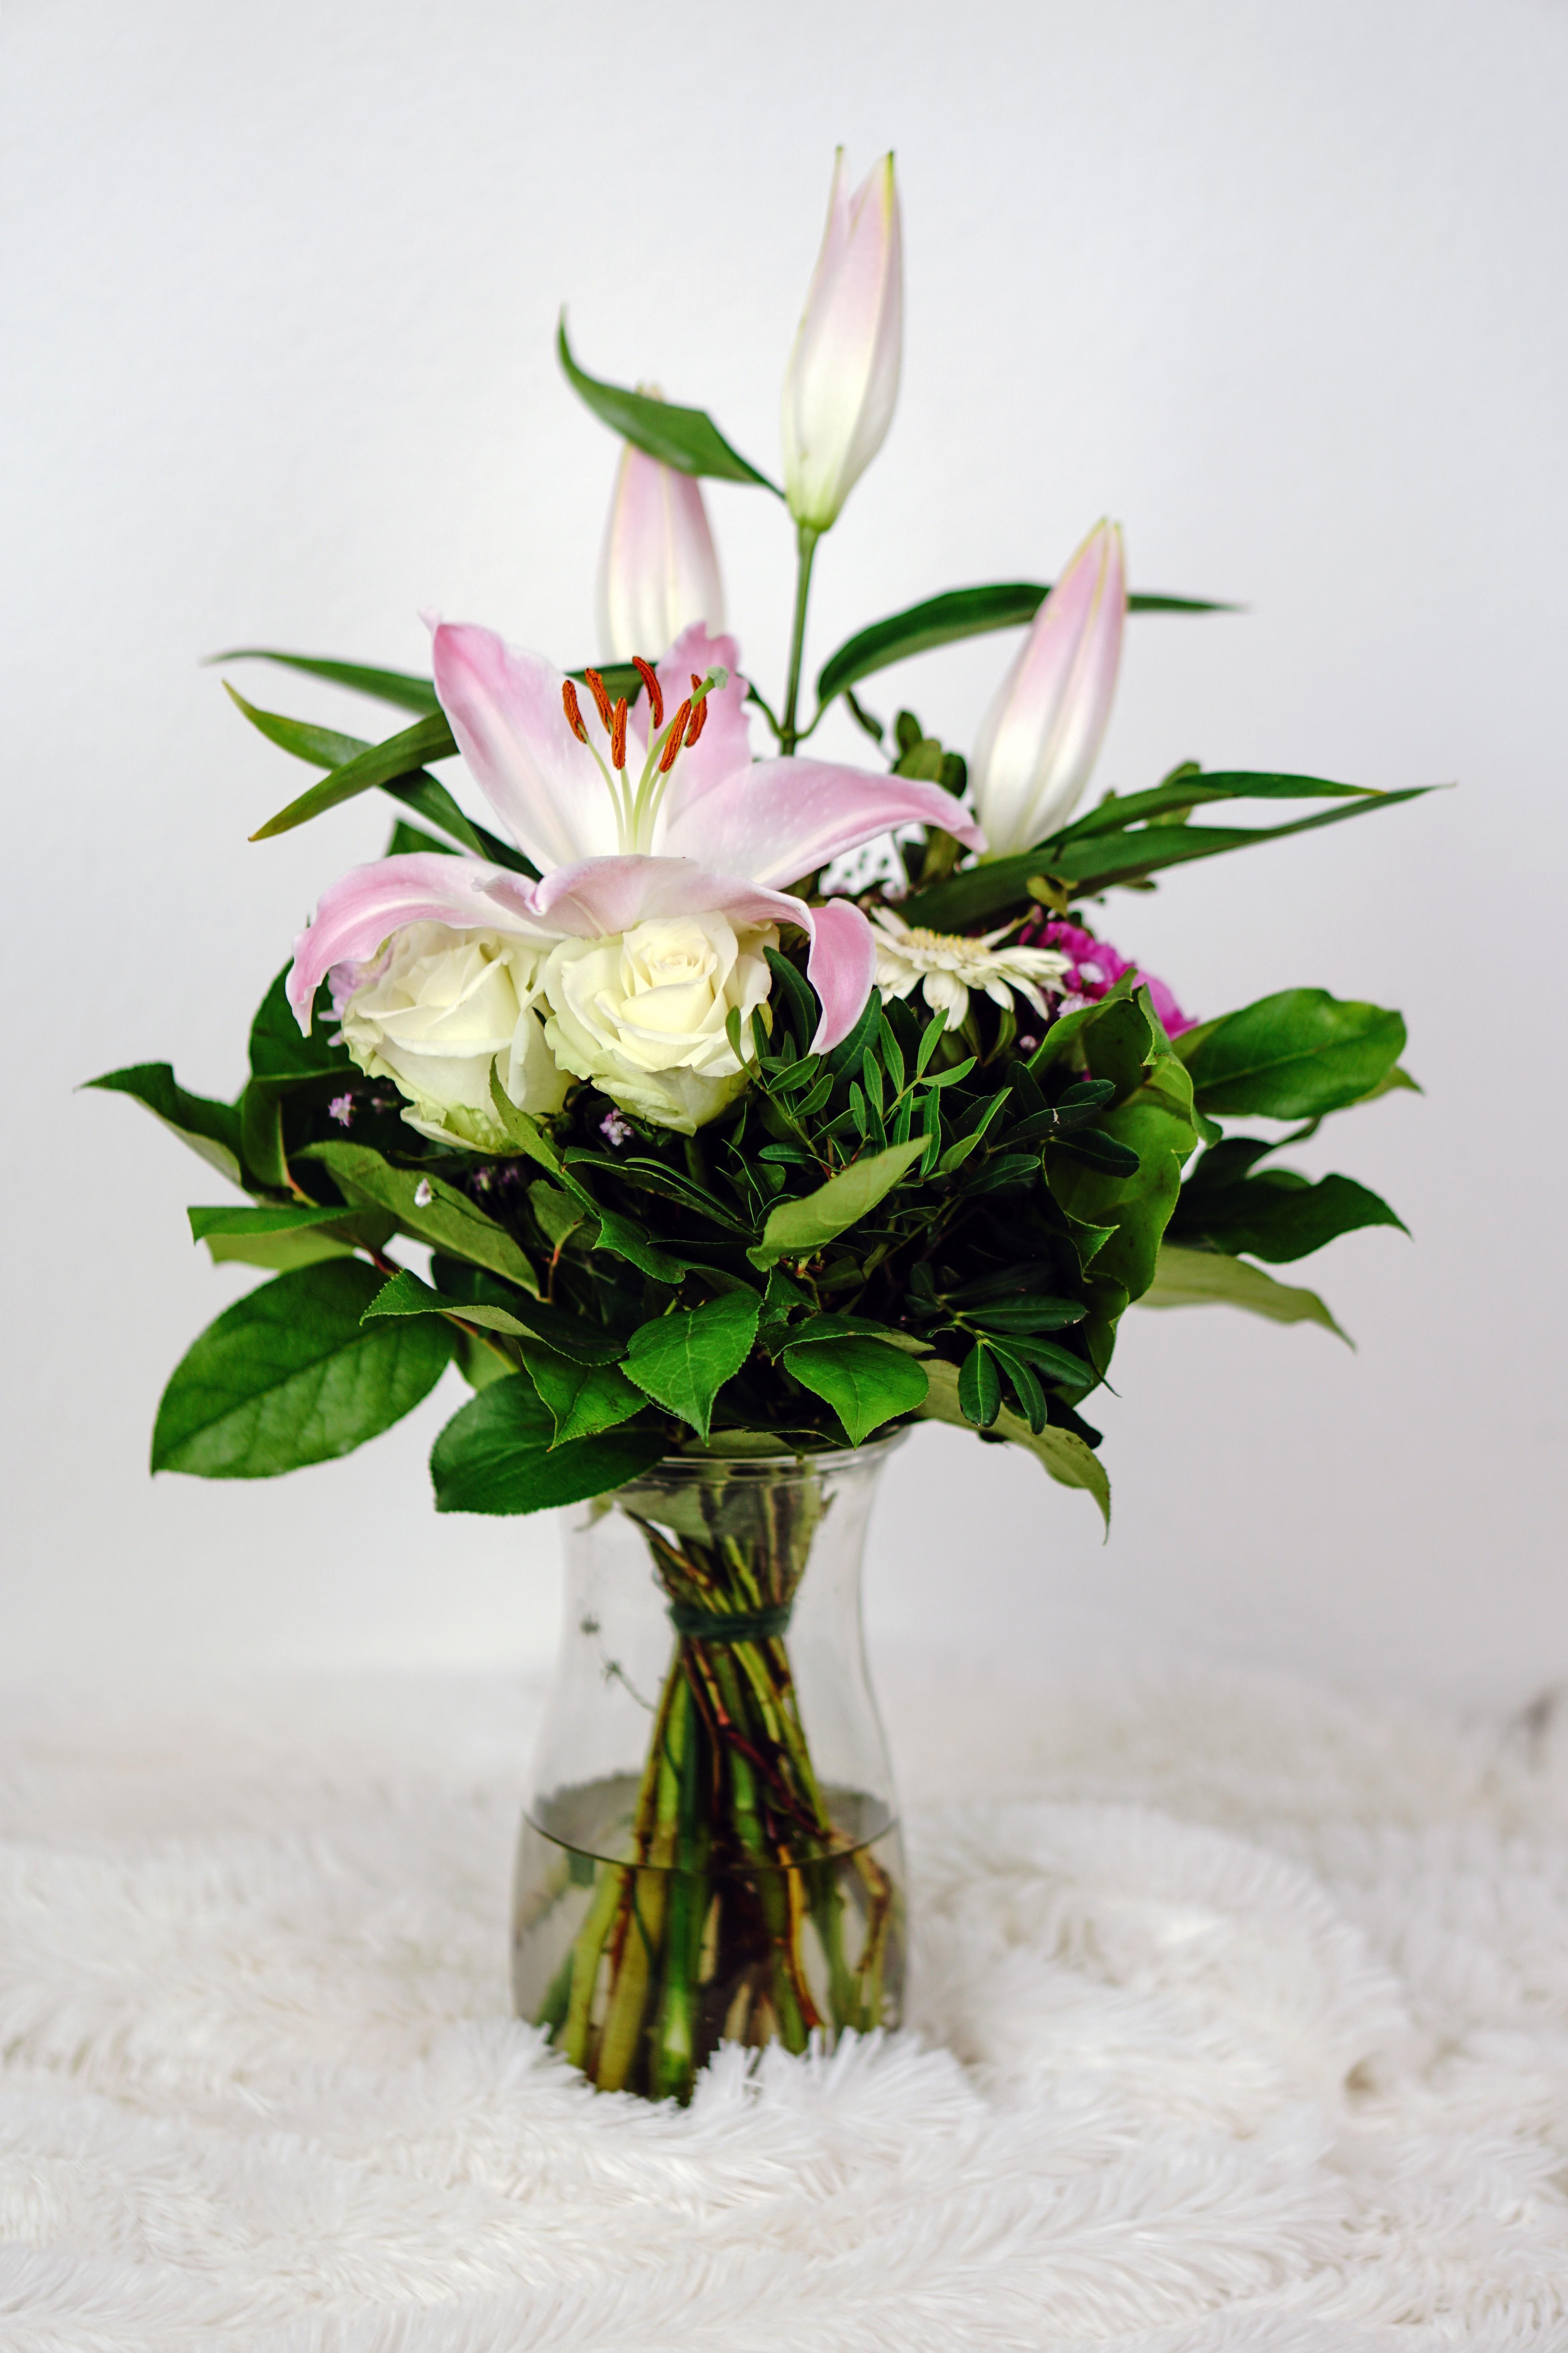 fotos gratis naturaleza flor florecer celebracion amor regalo decoracin verde vistoso rosado flora da de la boda flores art festival